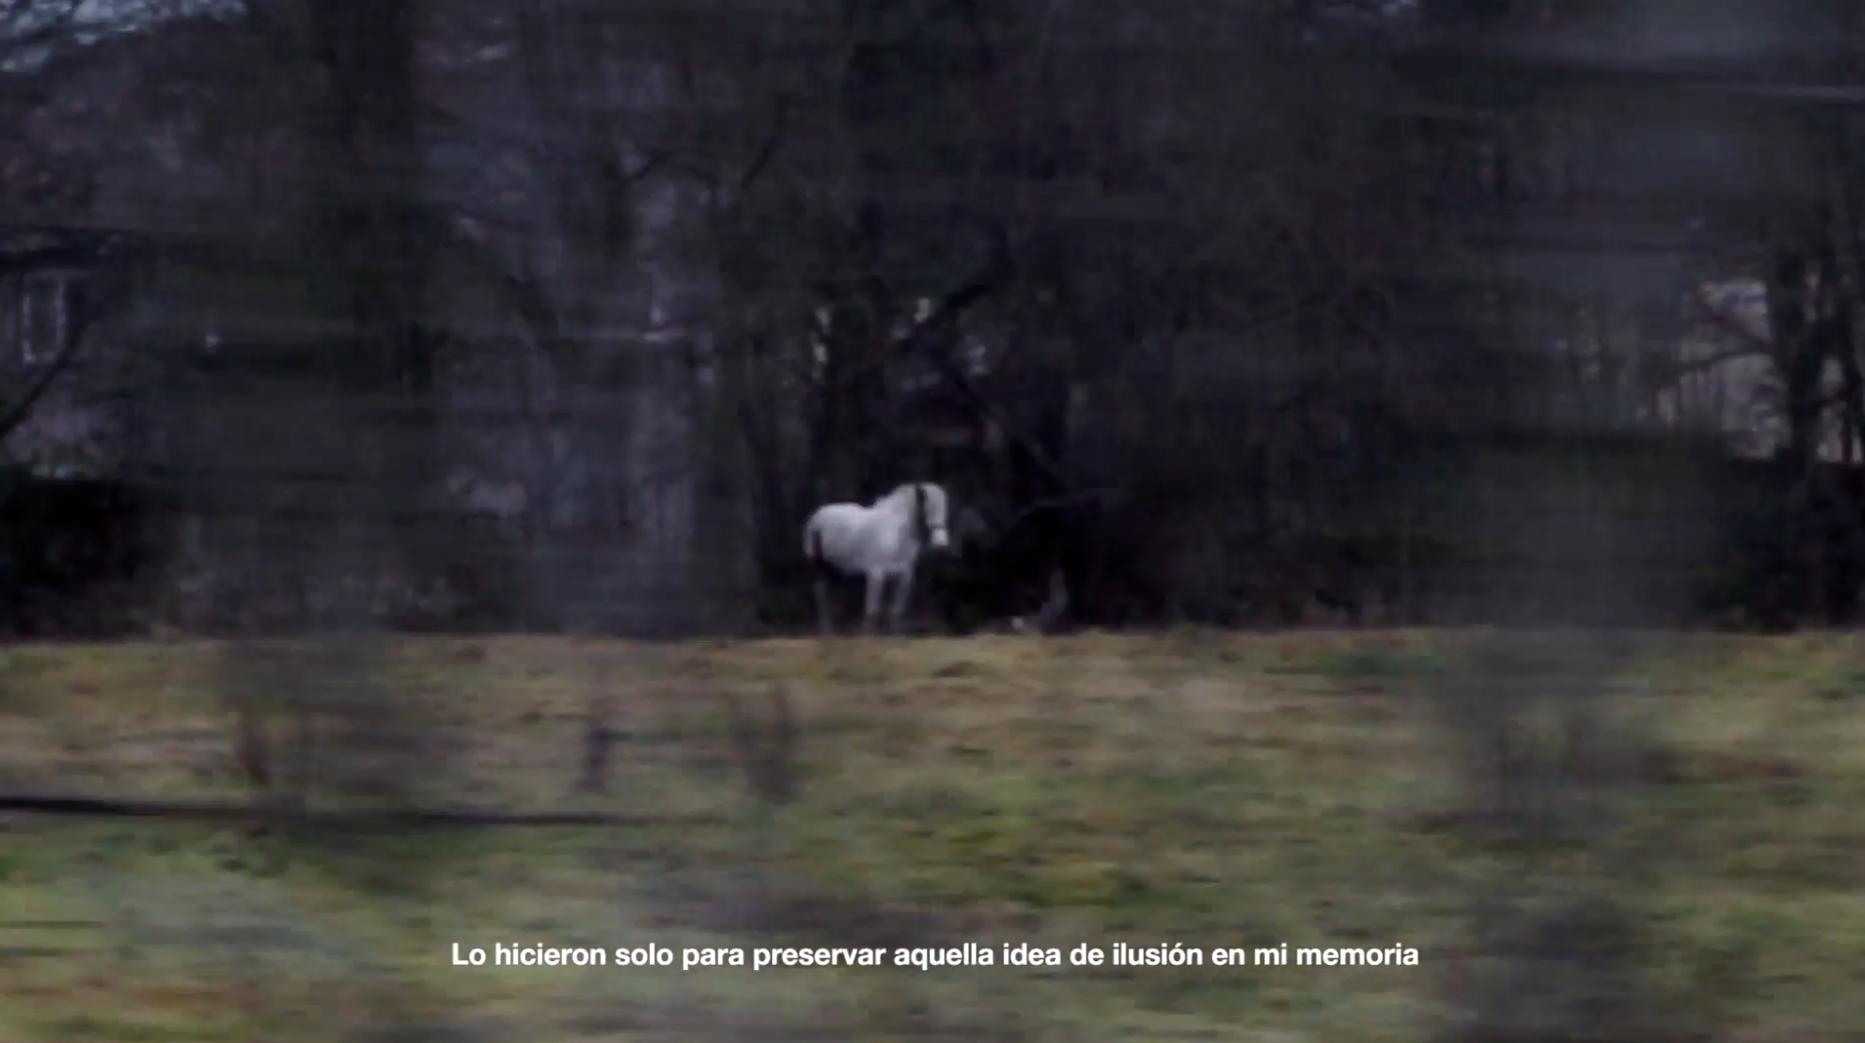 NUL·LA ESTÈTICA. CCMZ. 2018. Still frame